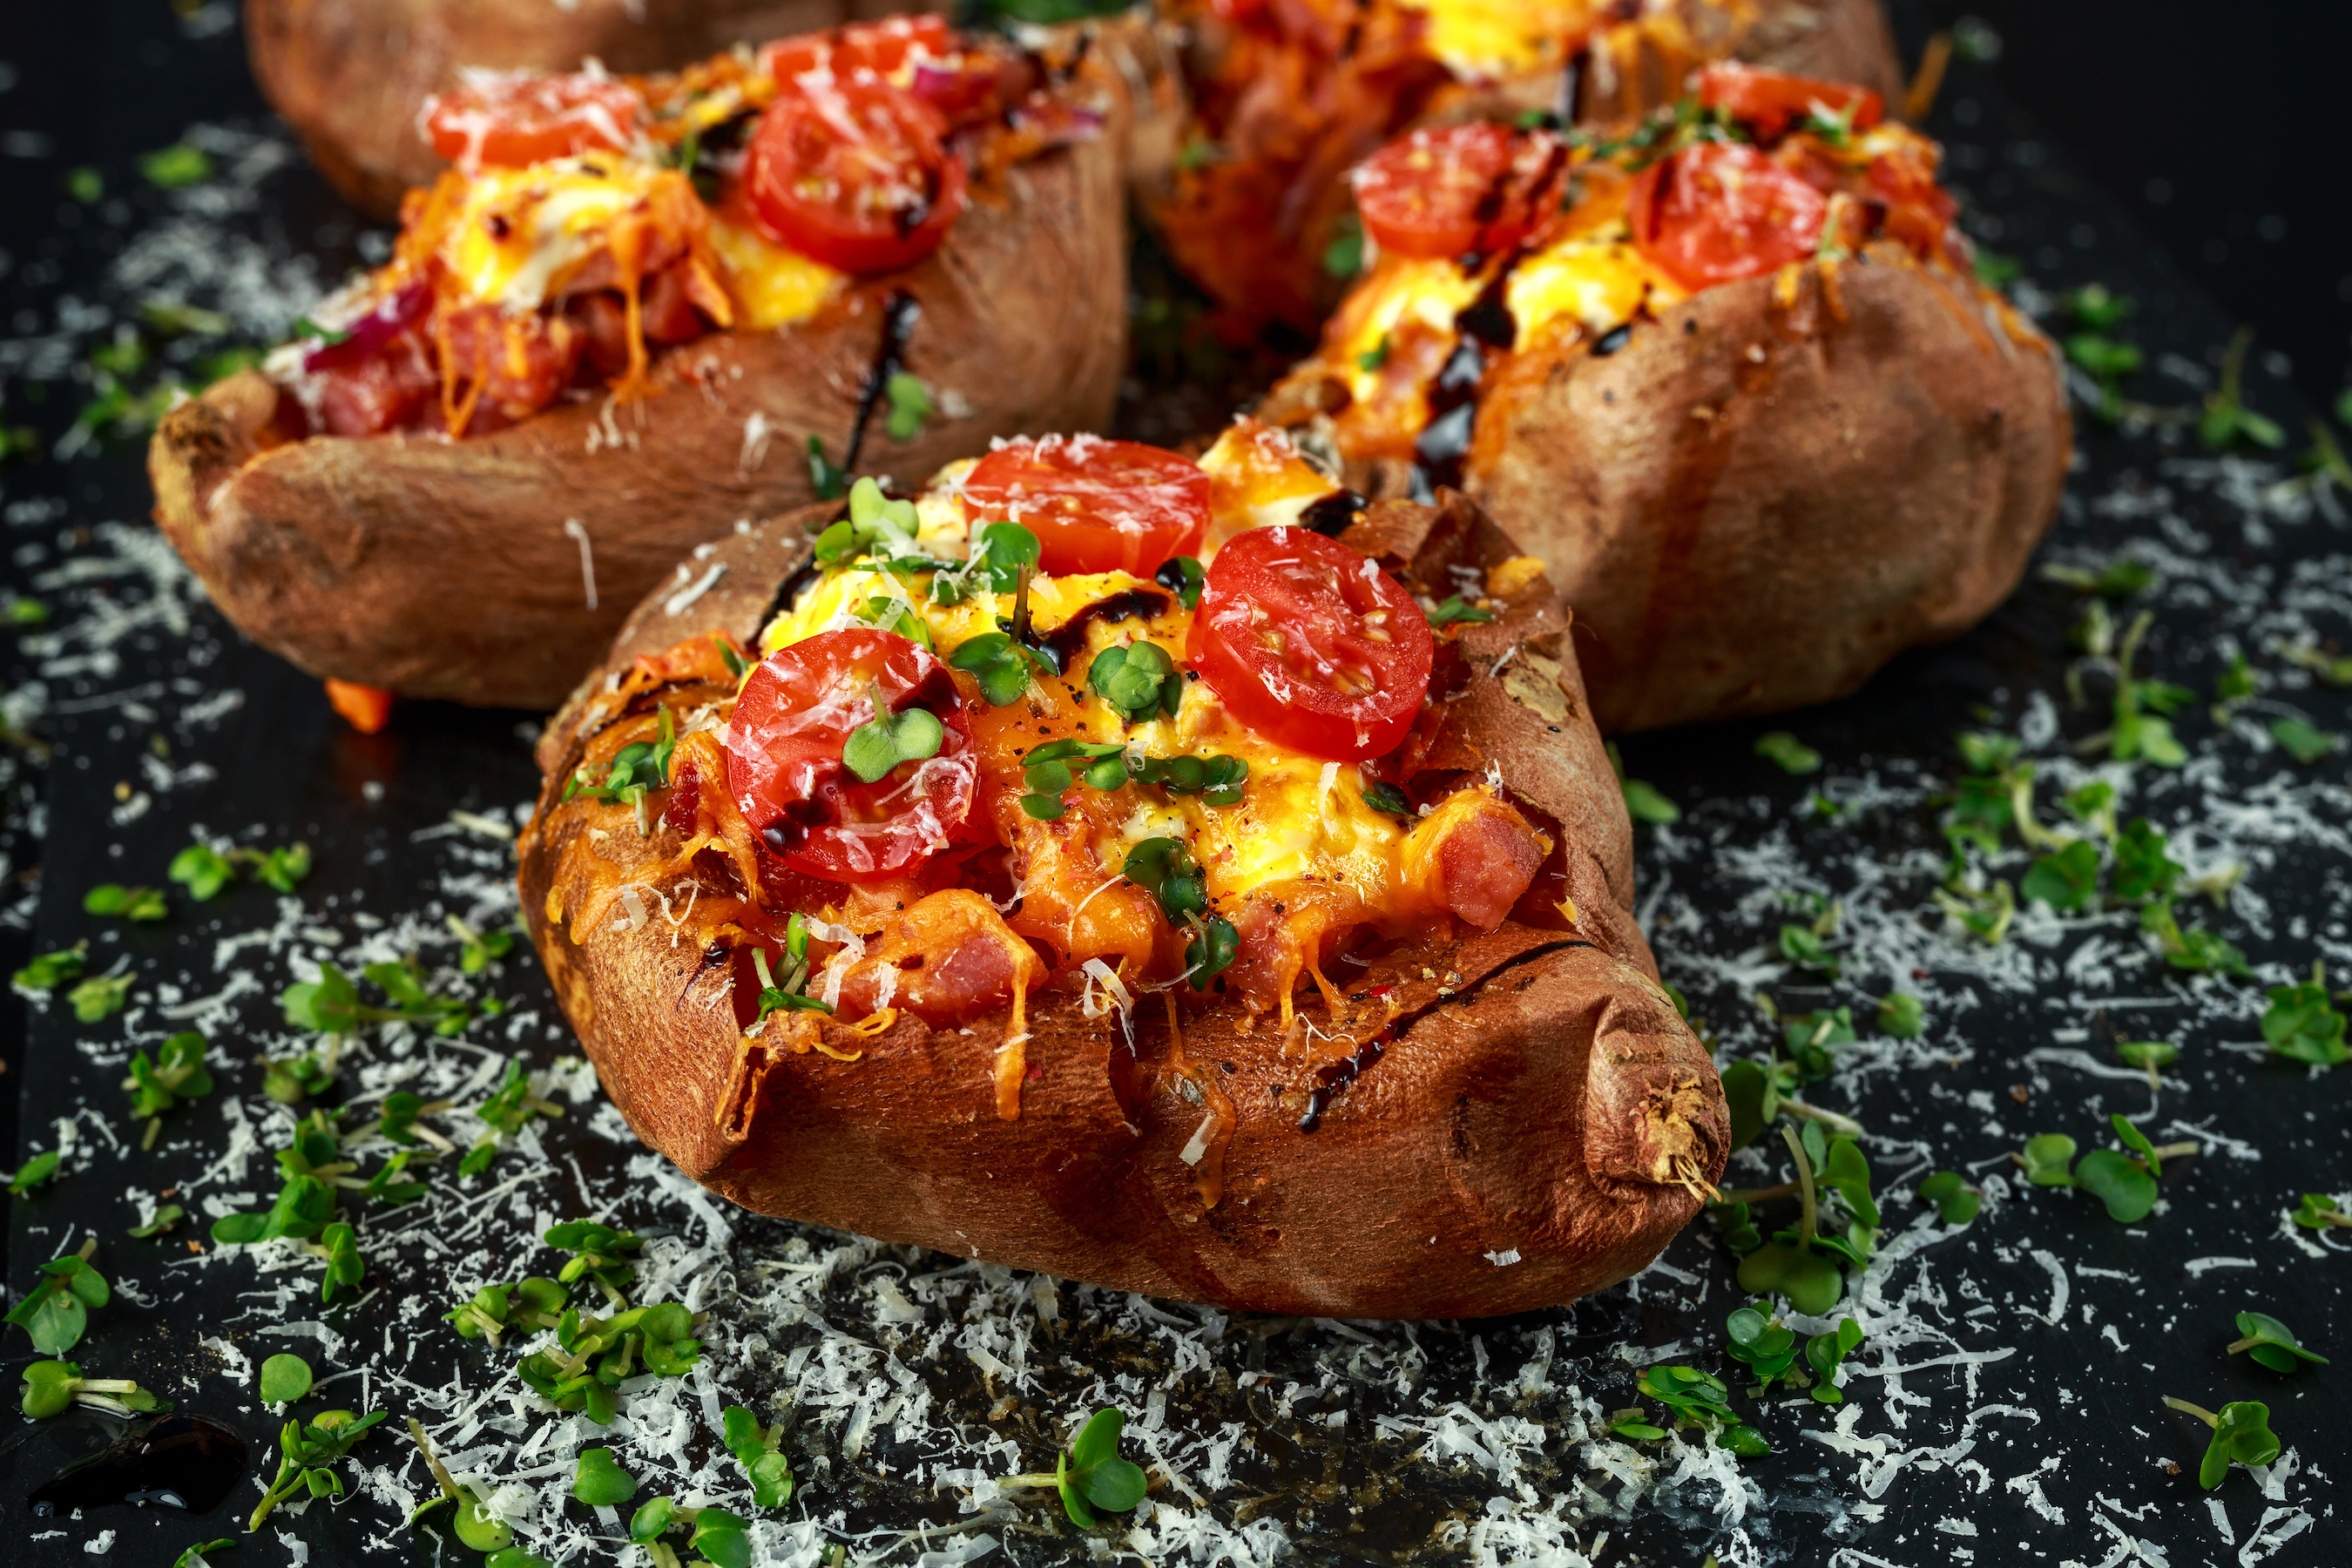 Bacon, tomato and cheese stuffed jacket sweet potato